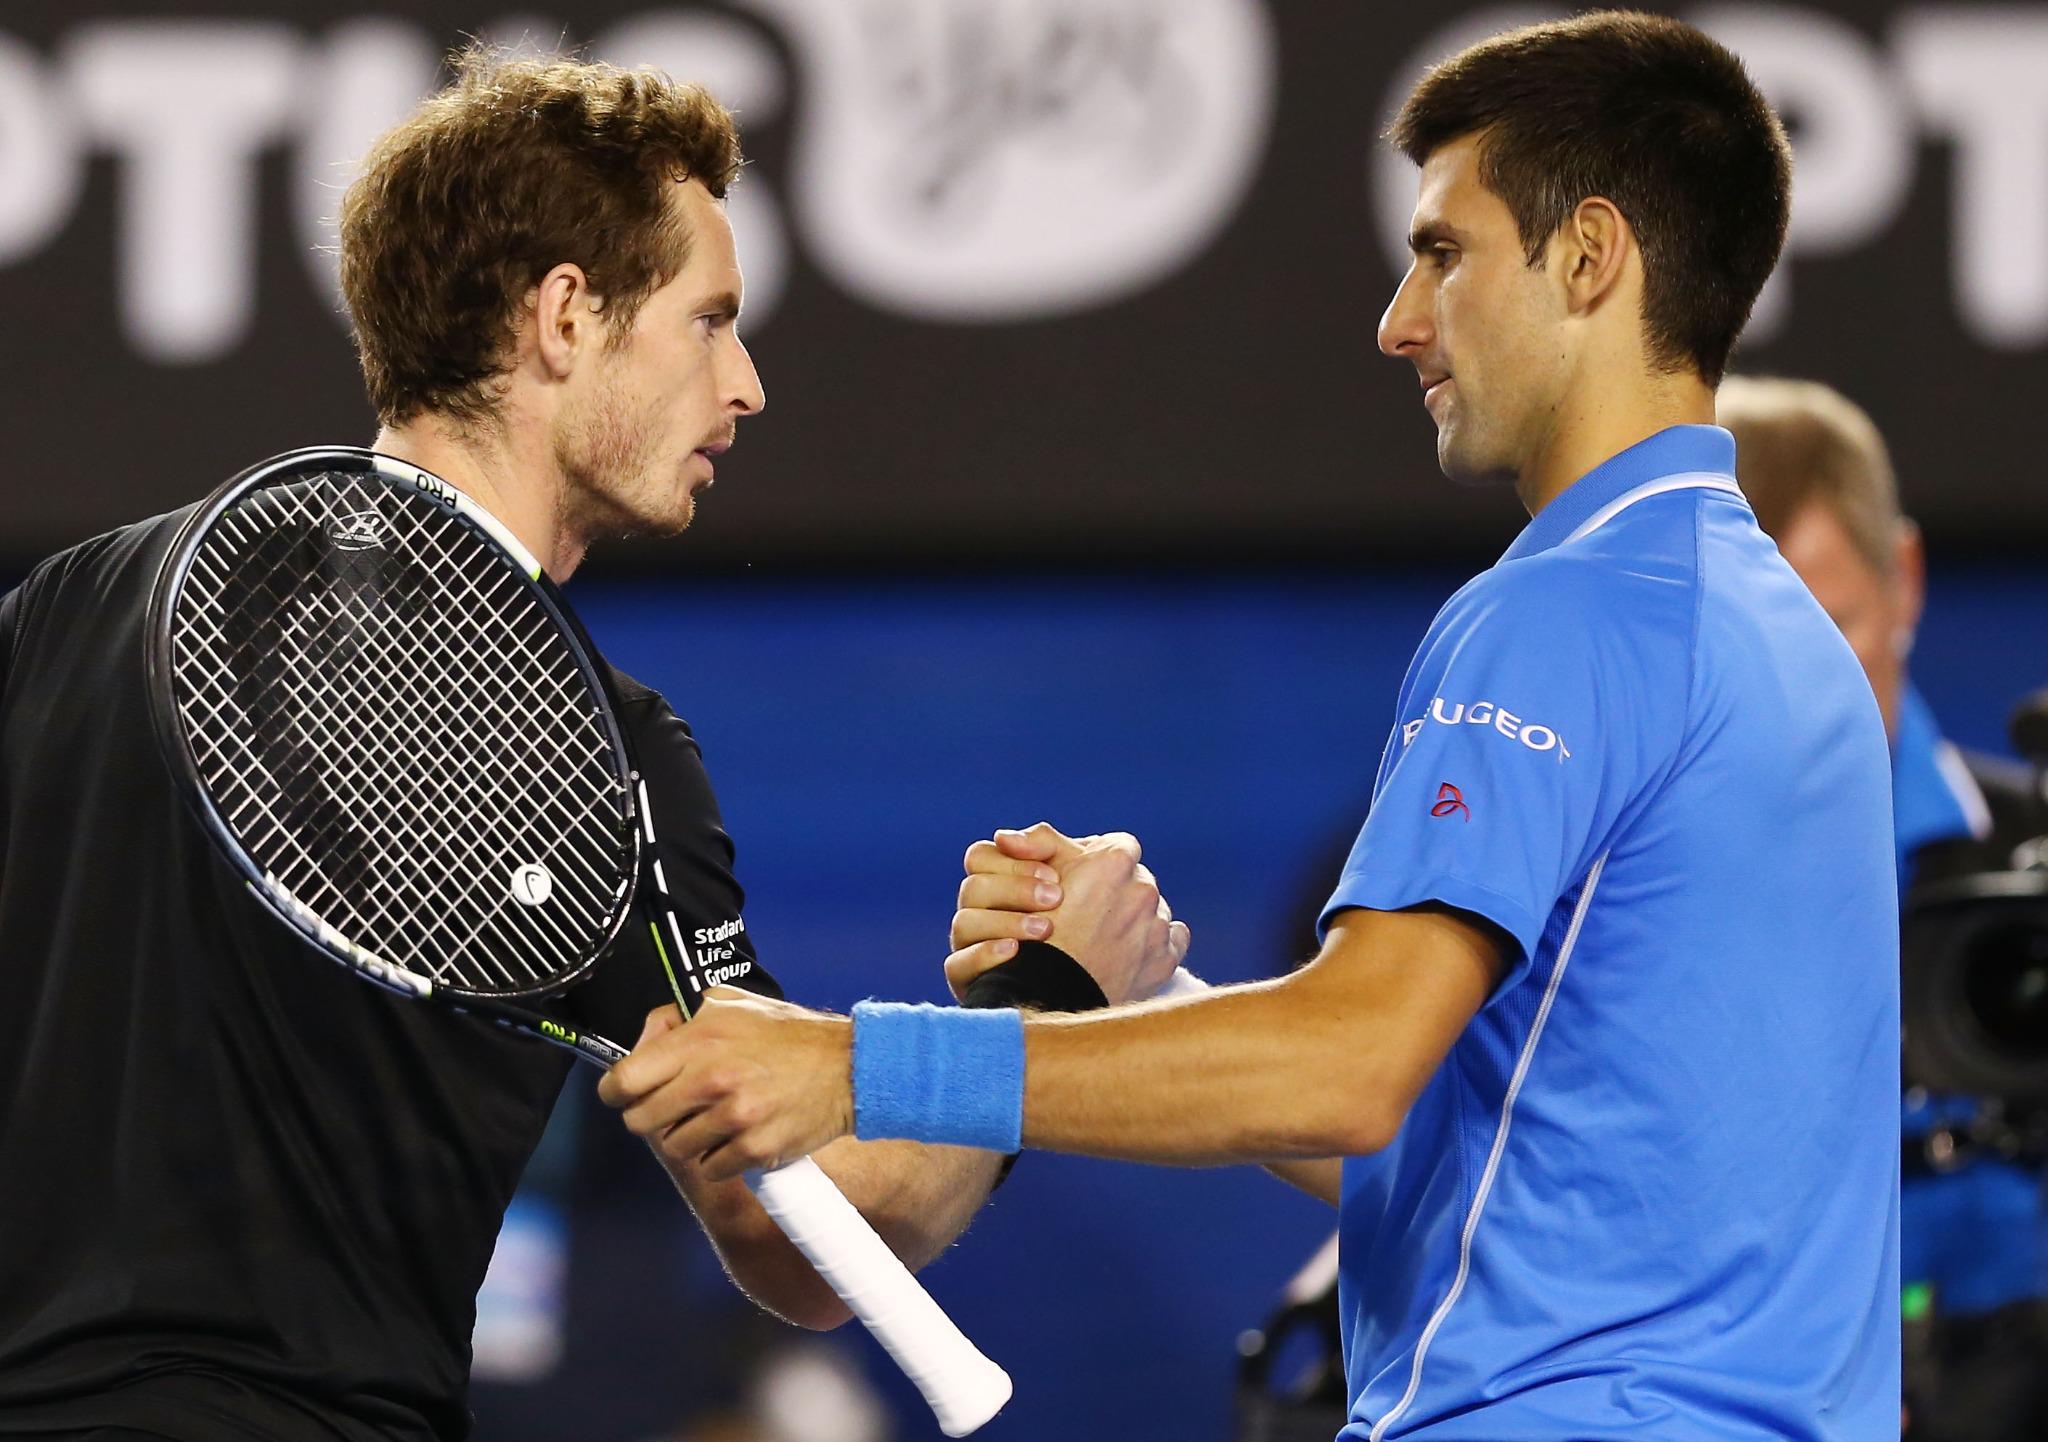 Djokovic saluda Murray - AO '15